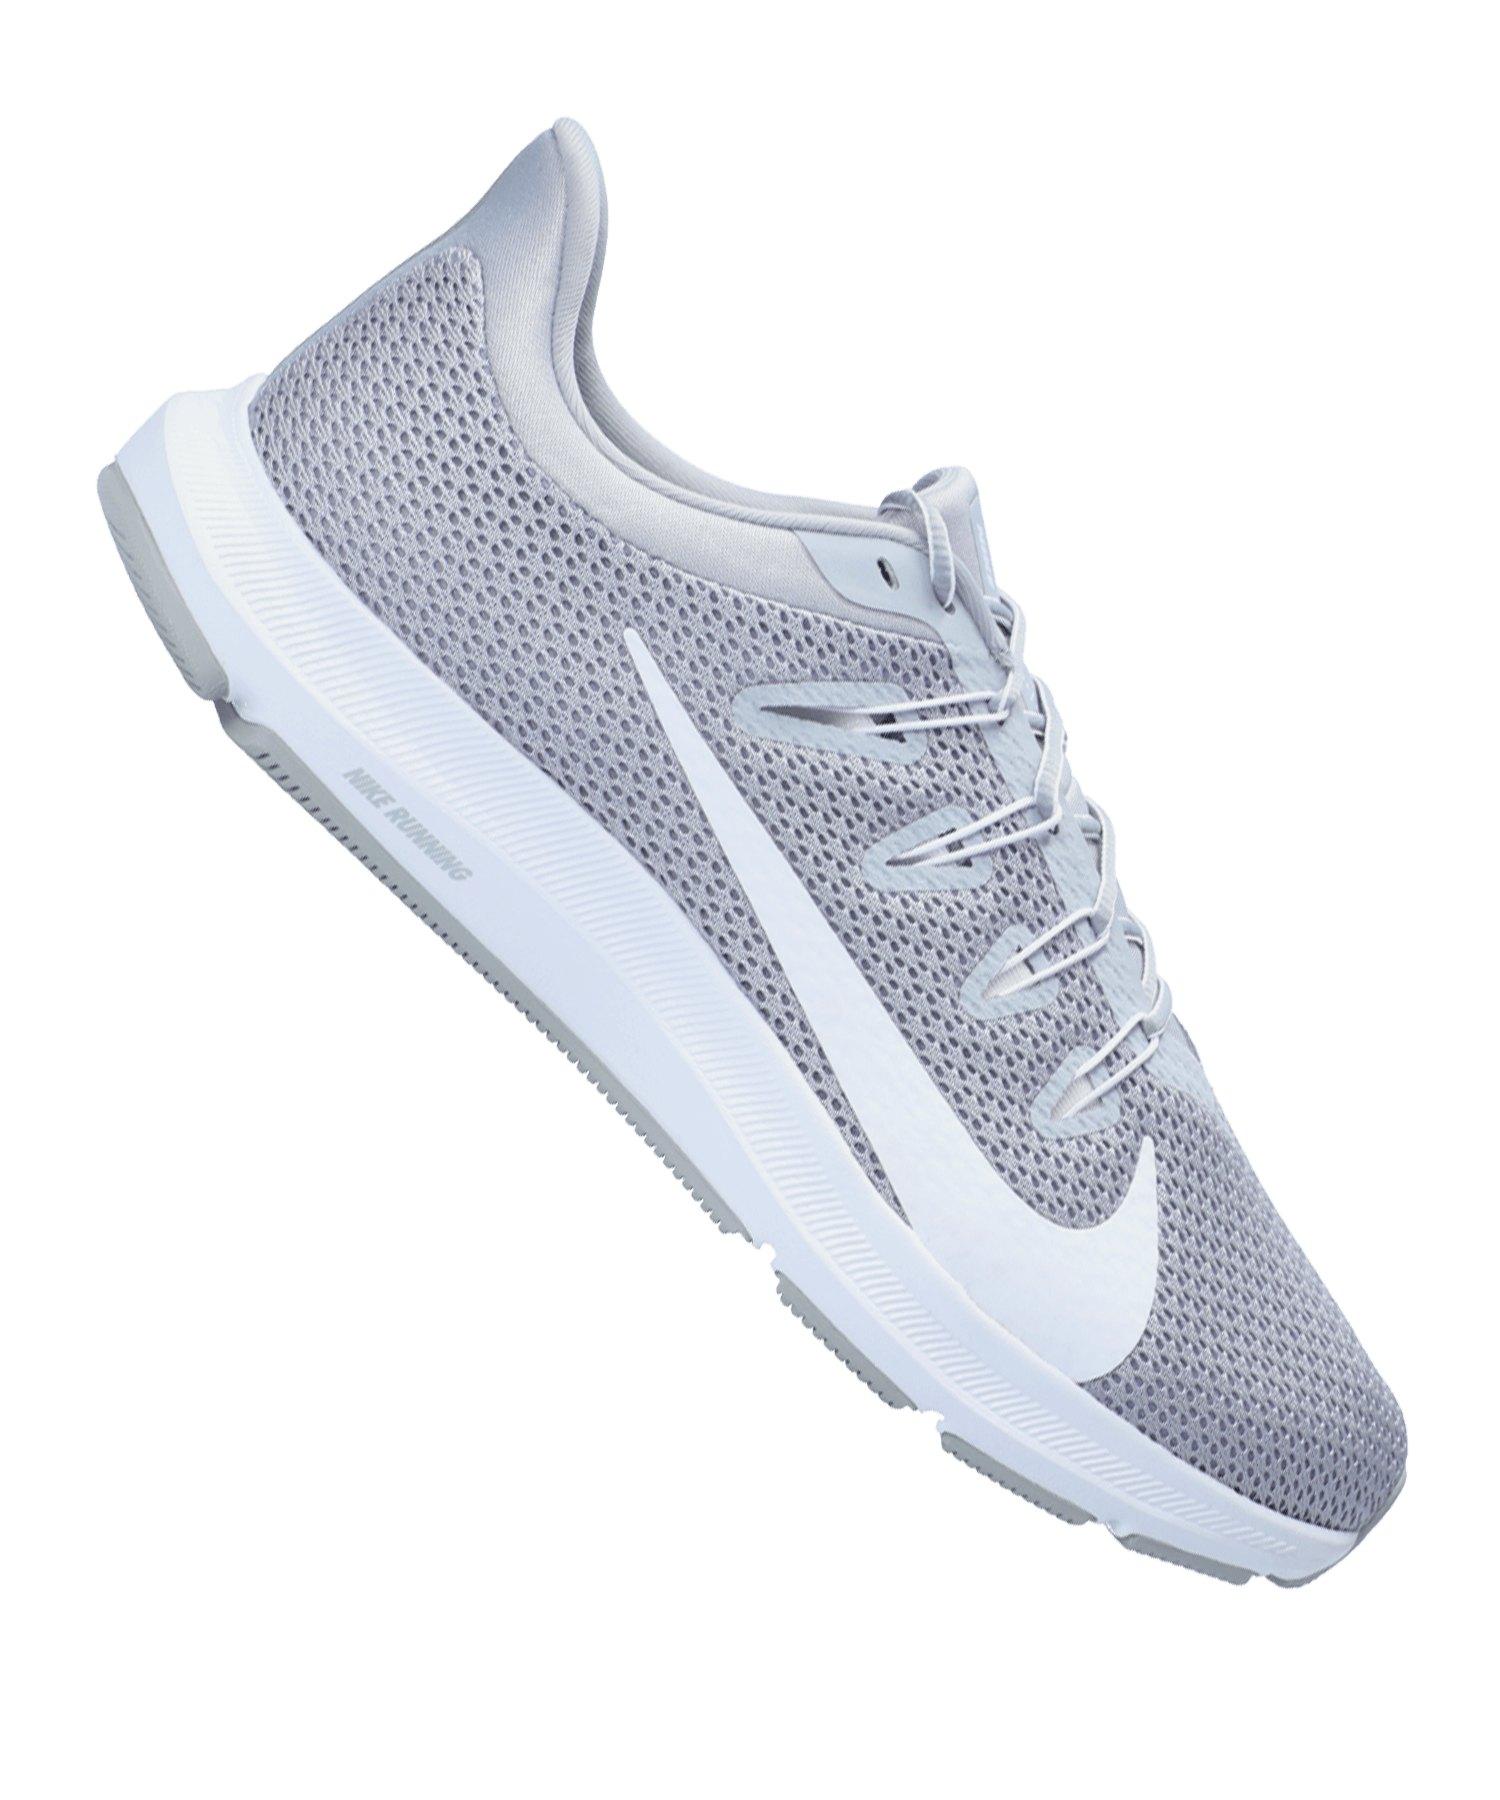 Nike Quest 2 Running Grau Weiss F004 - grau